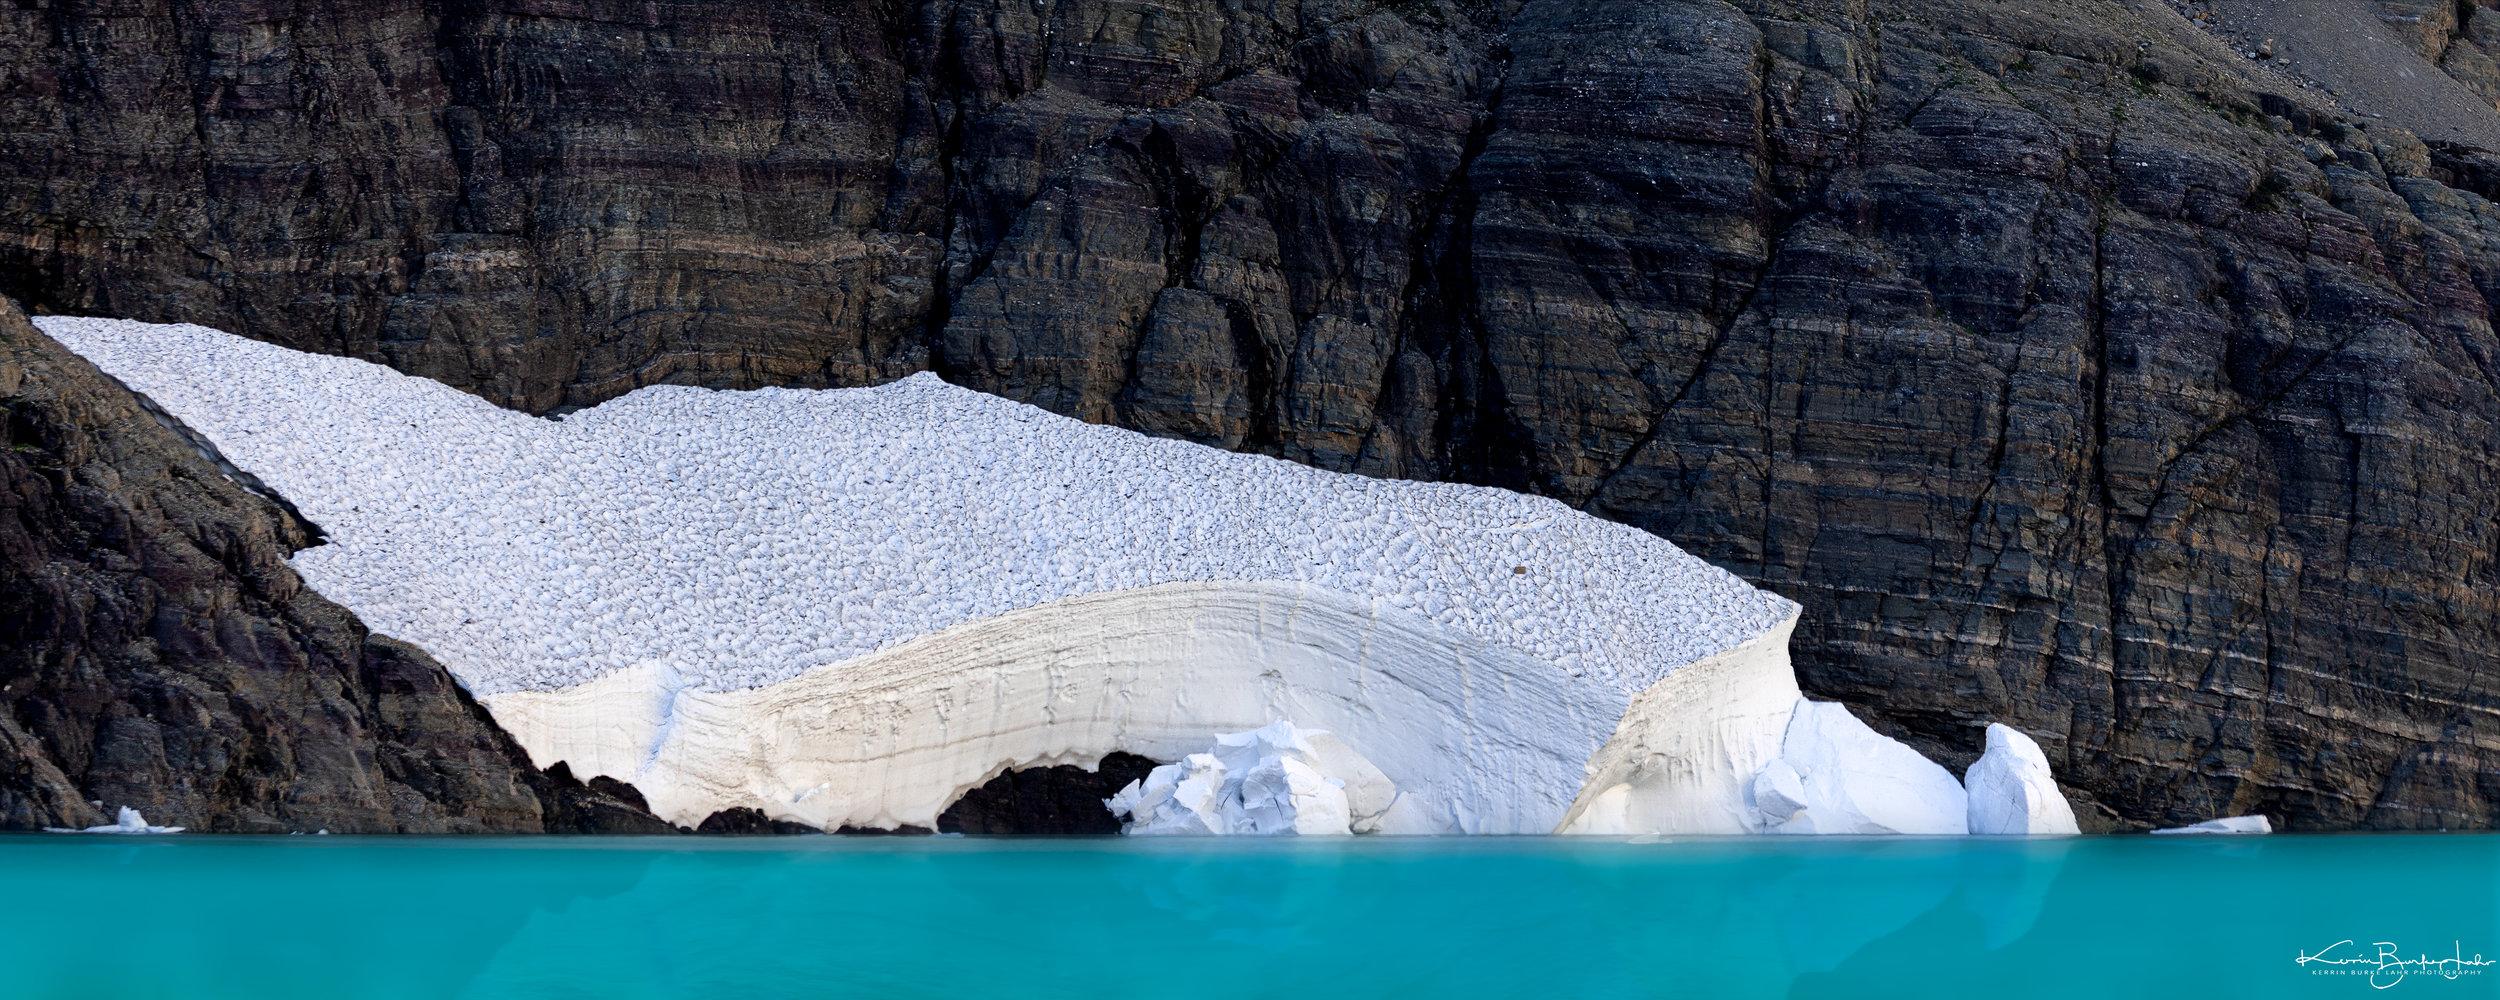 Glacier-National-Park-2019-234.jpg